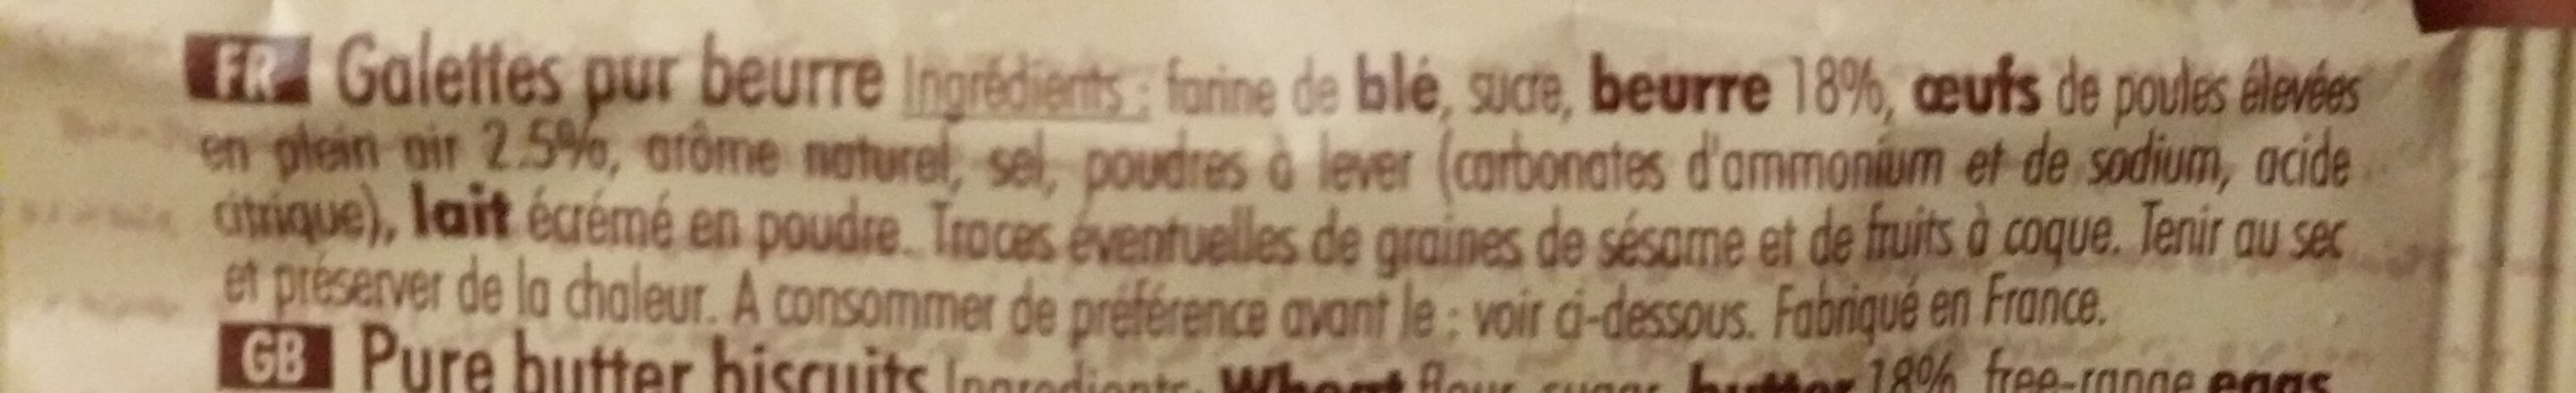 Galette - Ingrediënten - fr